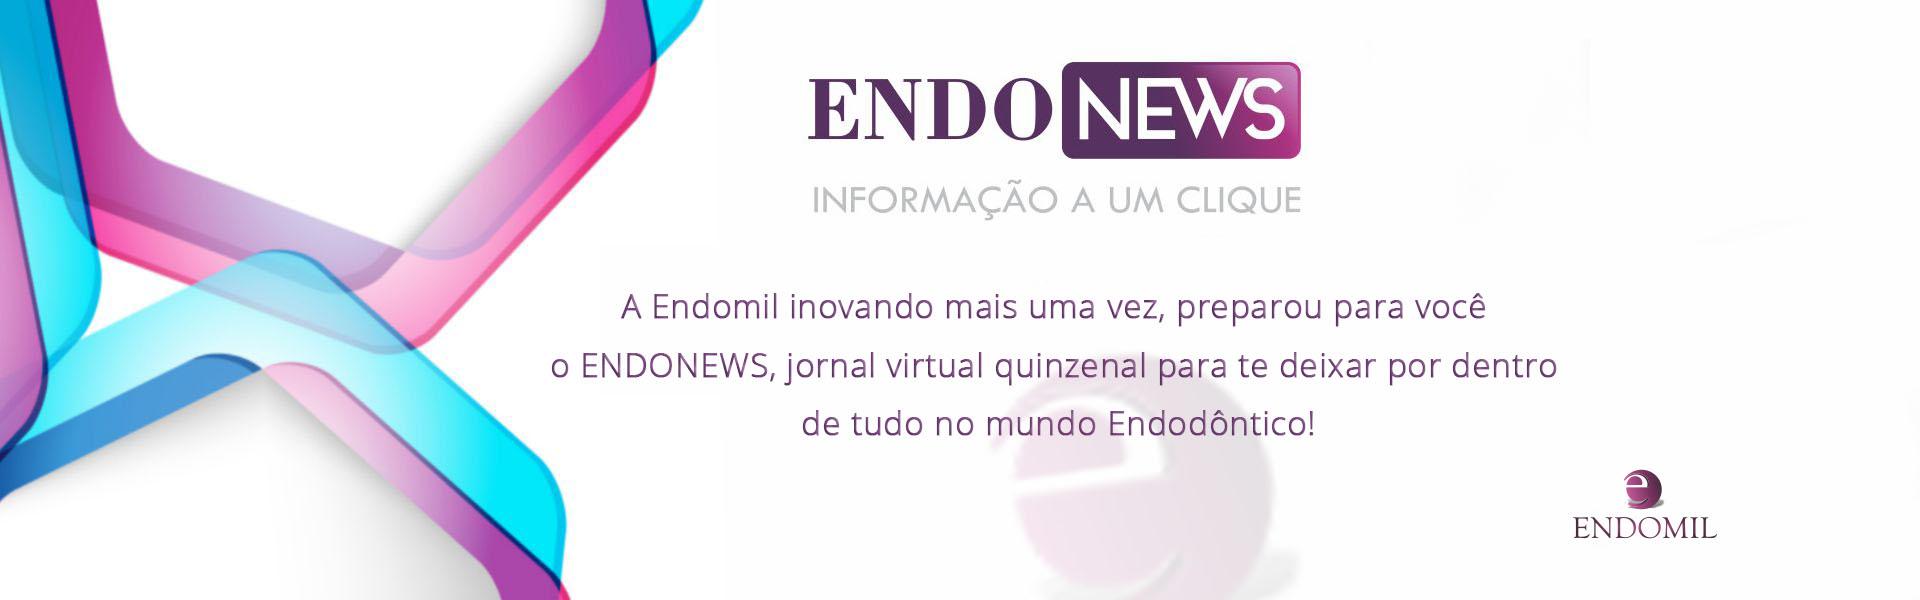 Endonews